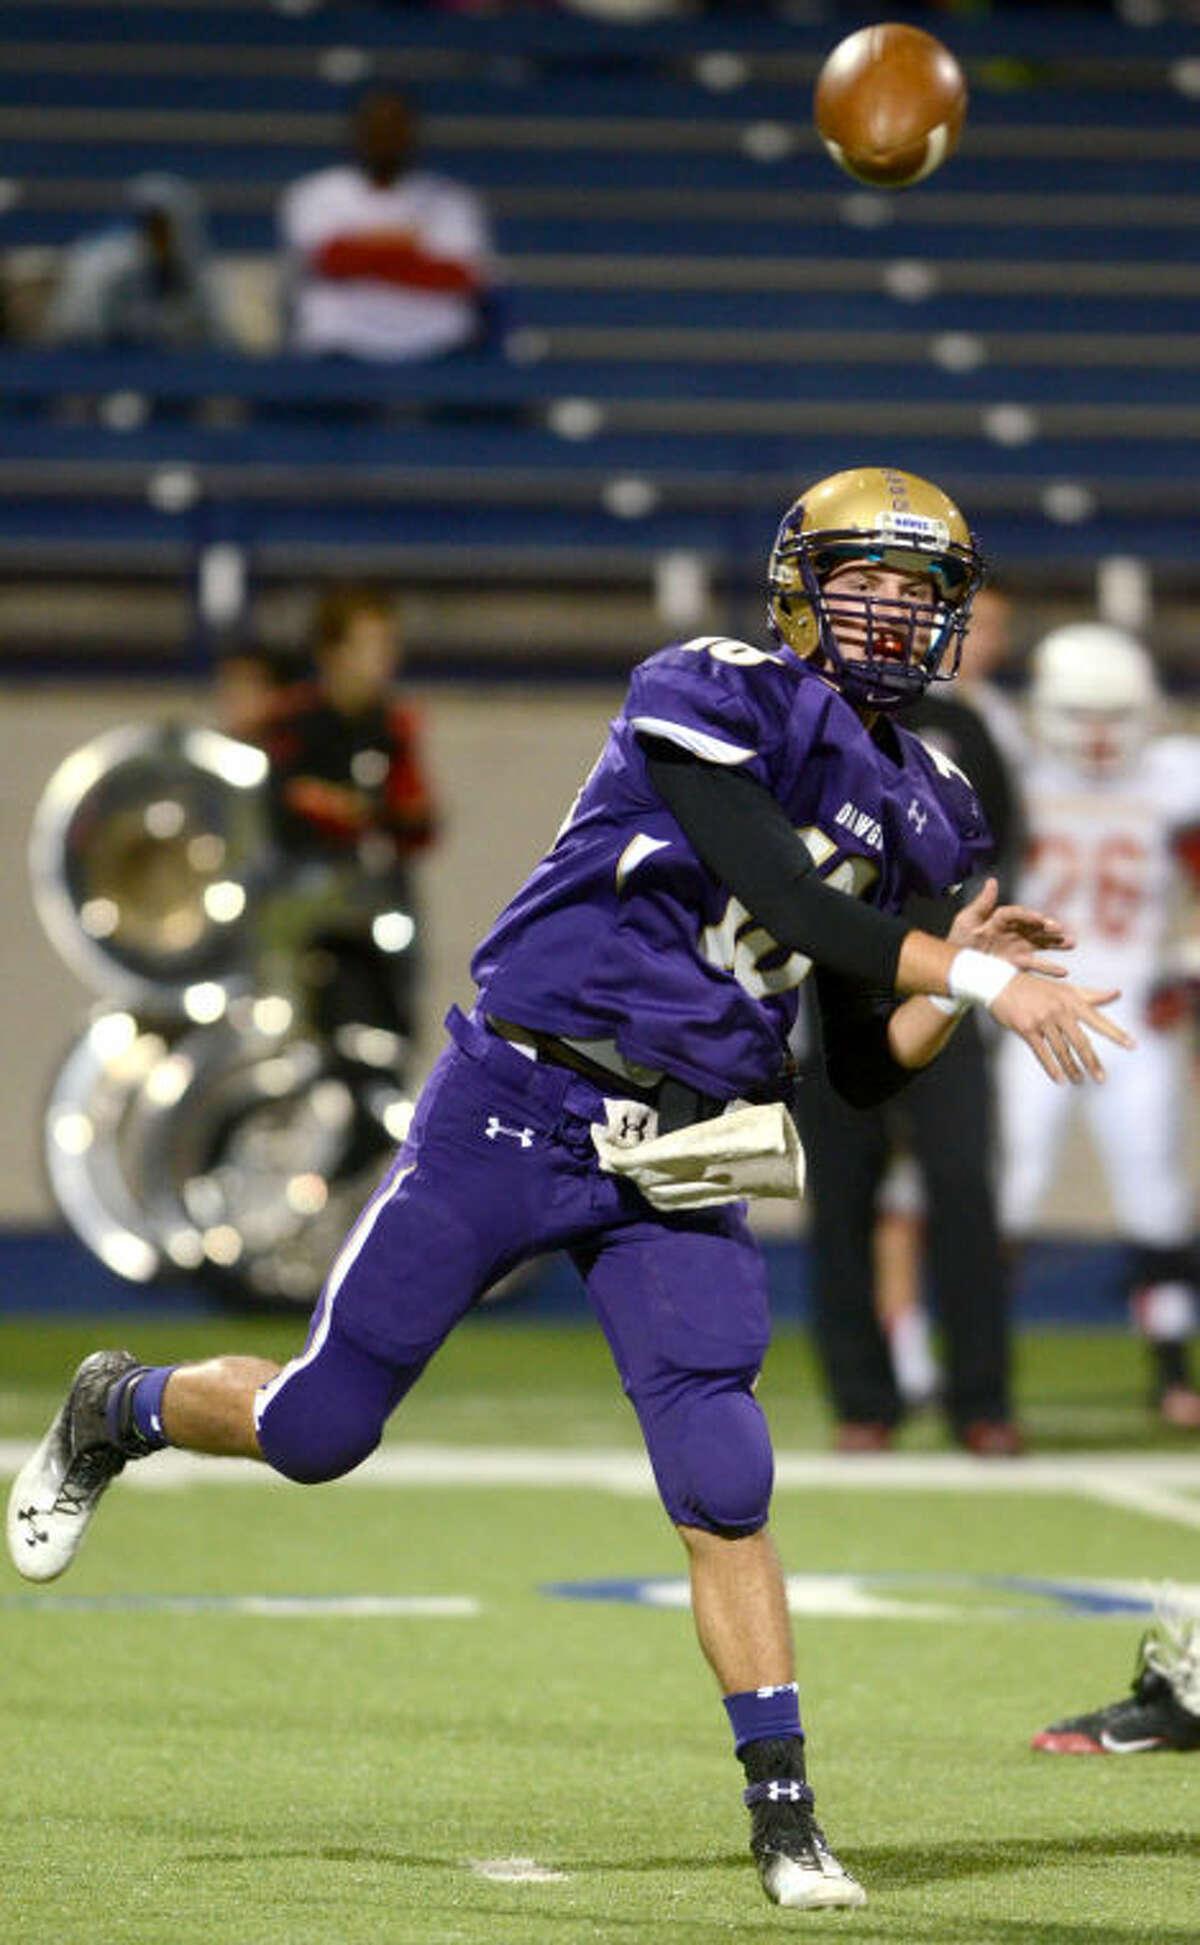 Midland High quarterback Ryan Goodrum throws against Lubbock Coronado on Friday at Grande Communications Stadium. James Durbin/Reporter-Telegram